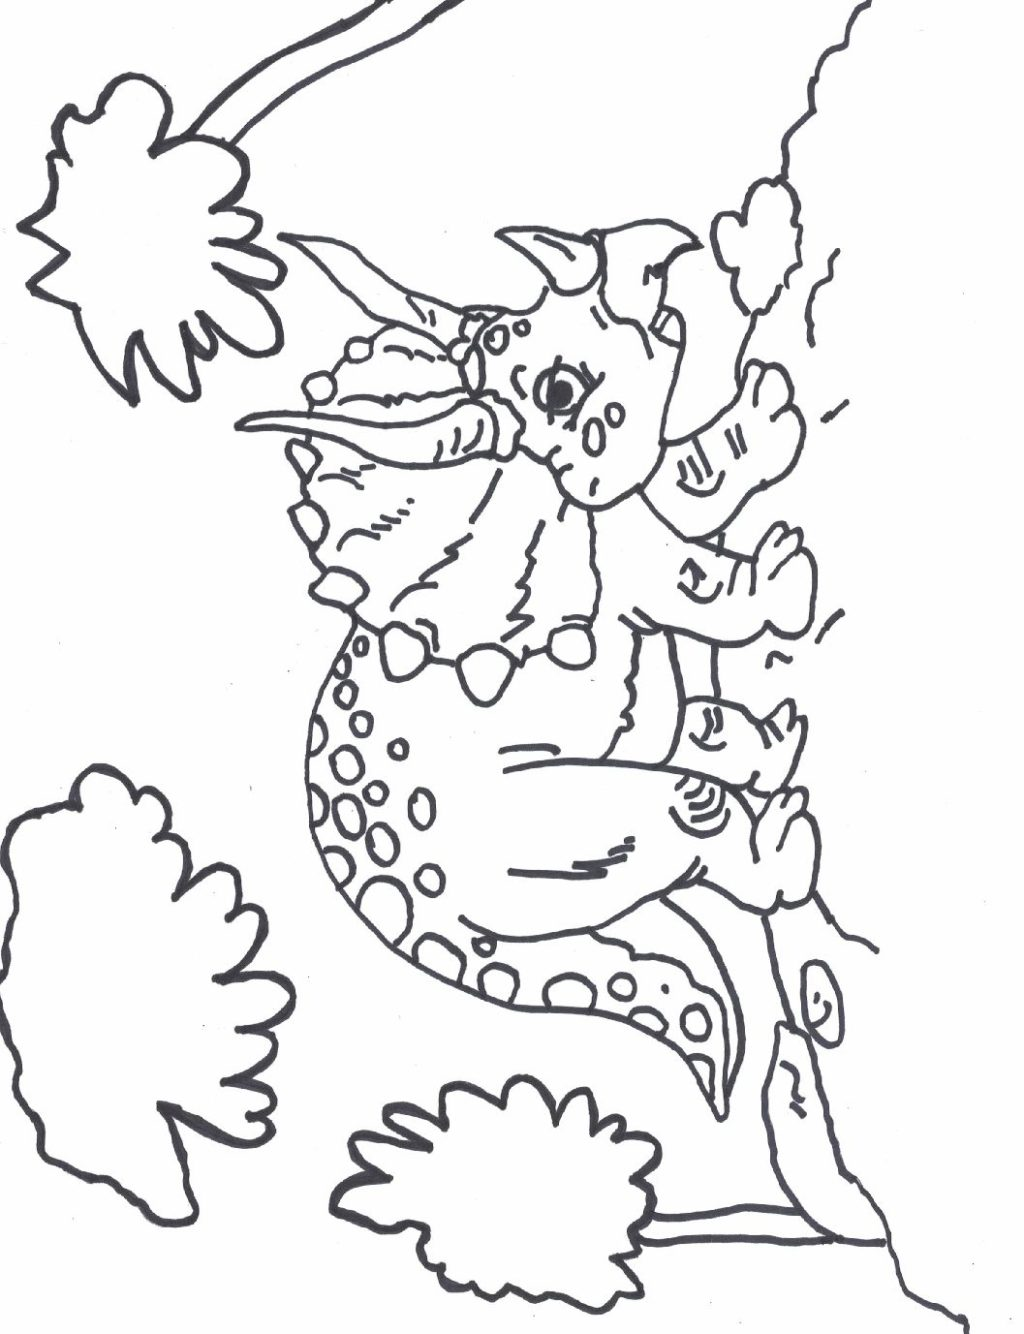 Dinosaur Coloring Sheet - Chester Library